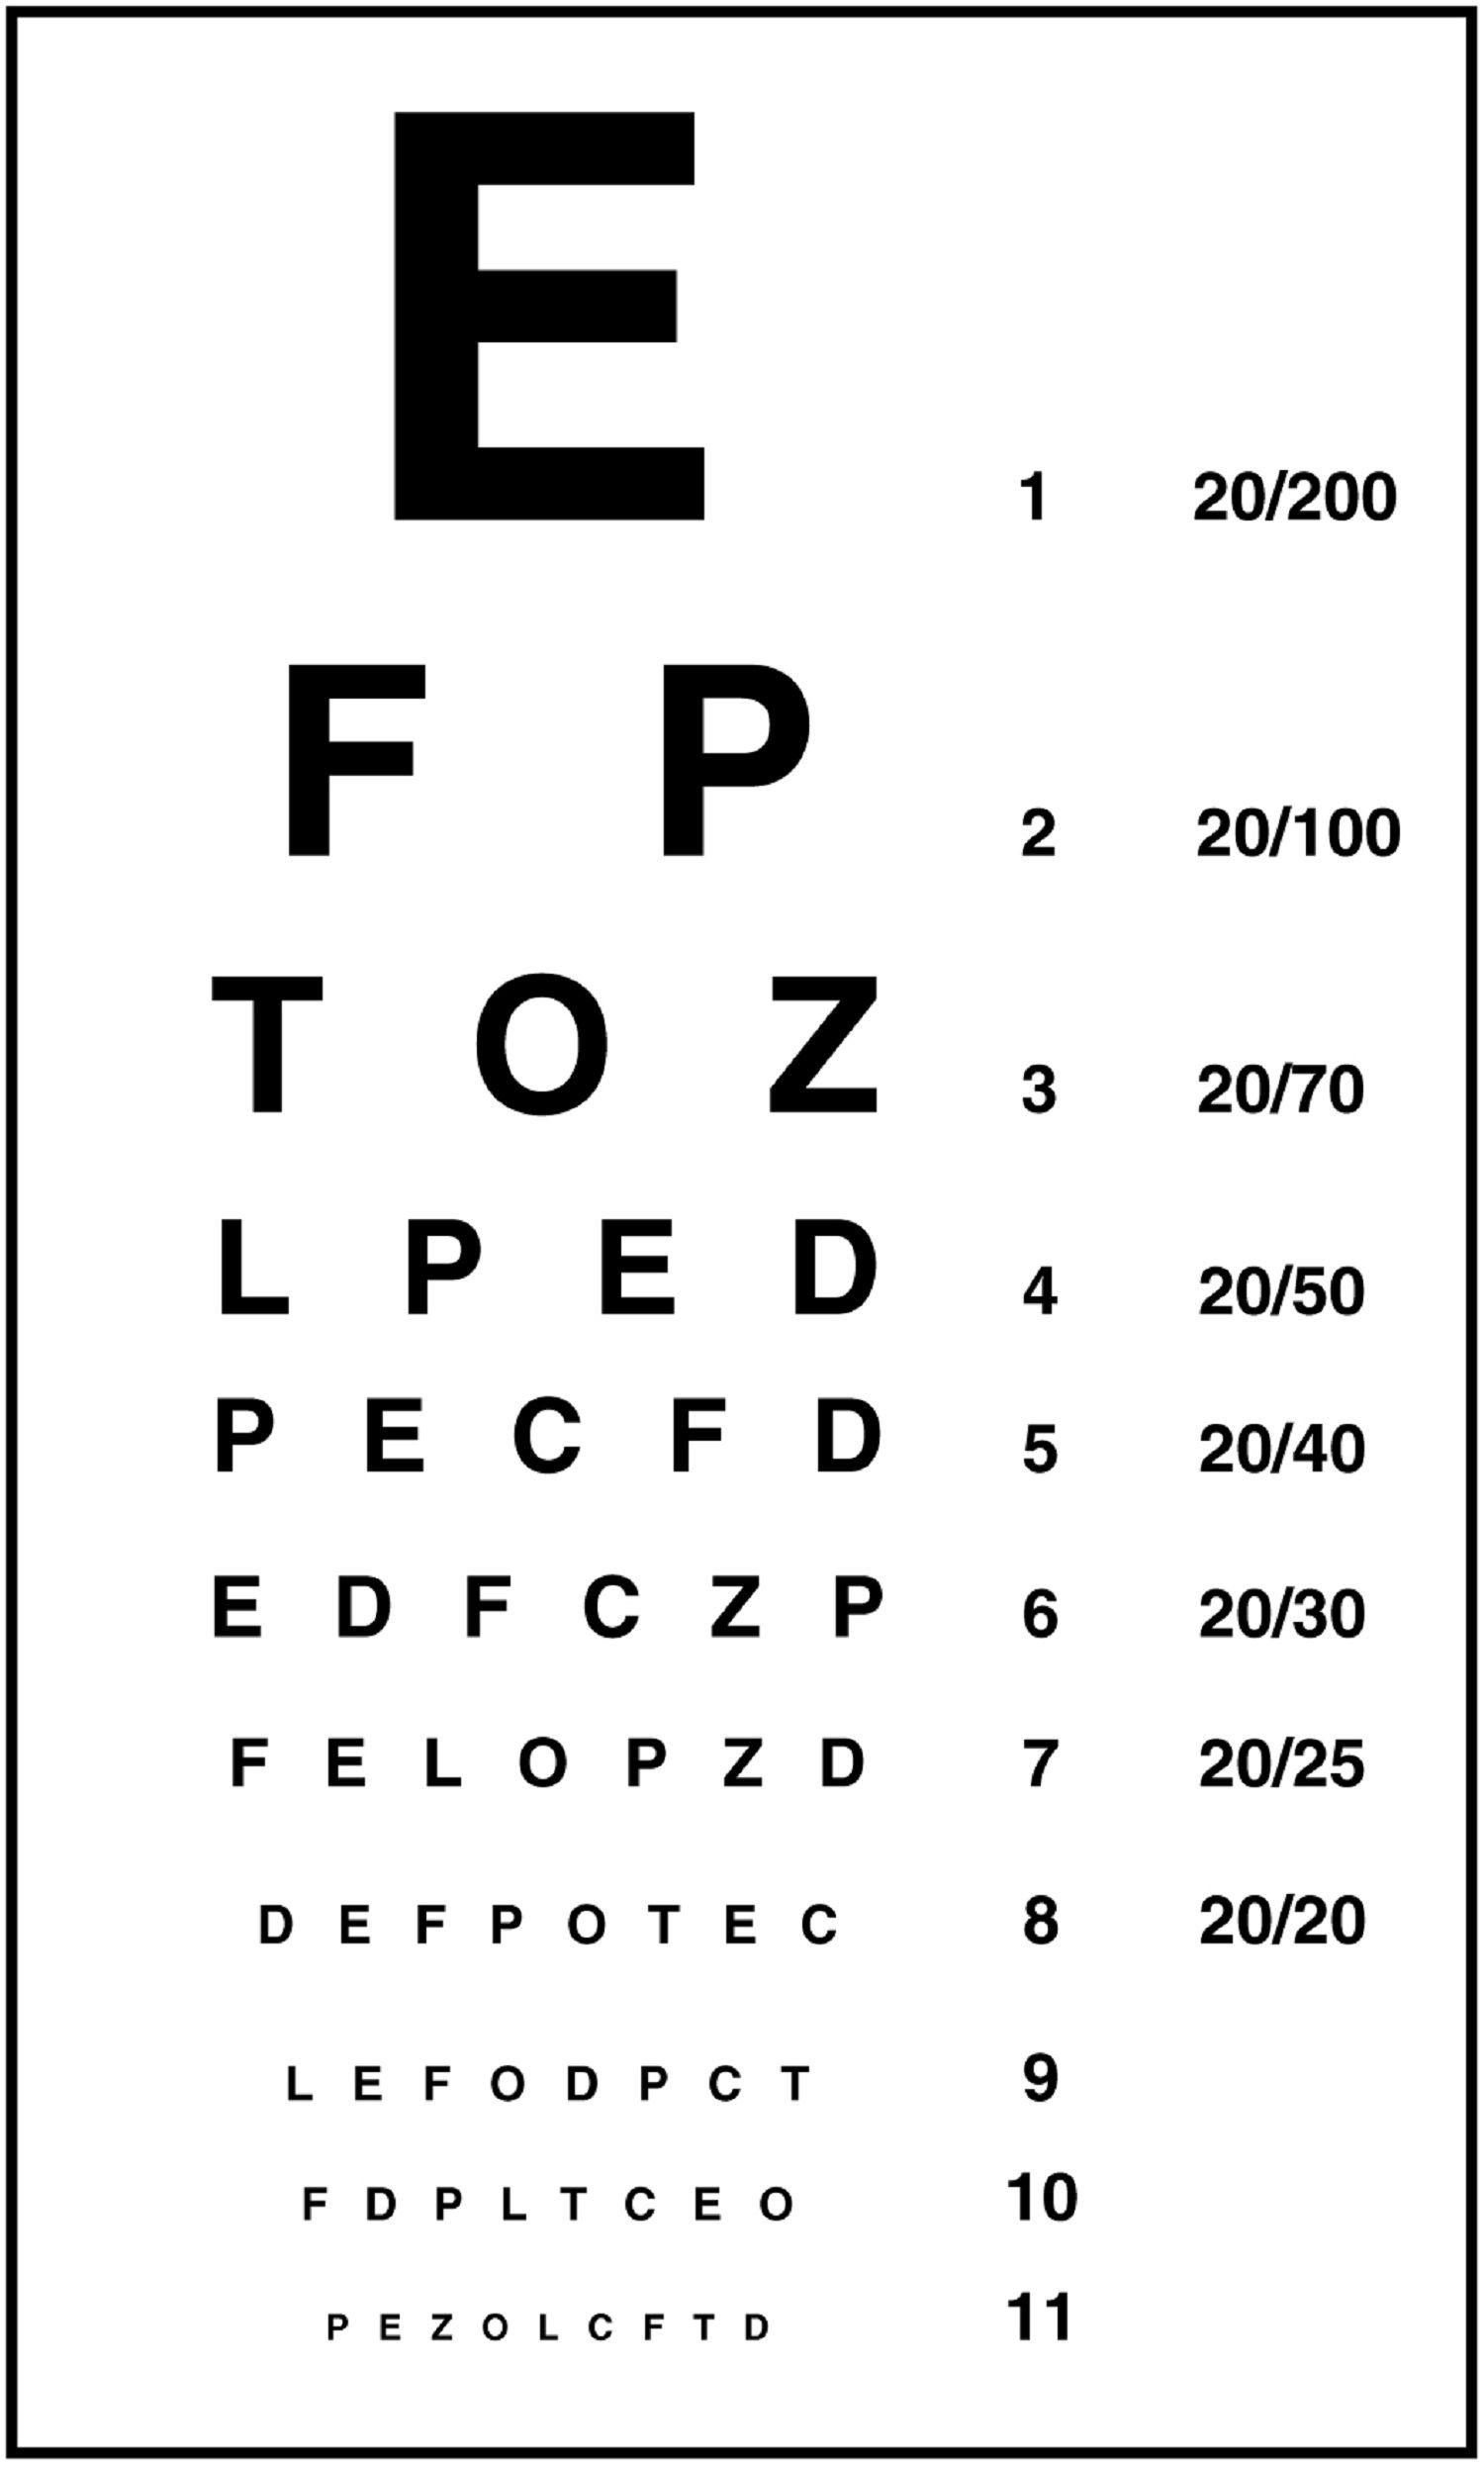 medium resolution of eye exam for diagrams easy wiring diagrams mummy diagram chart eye chart diagram